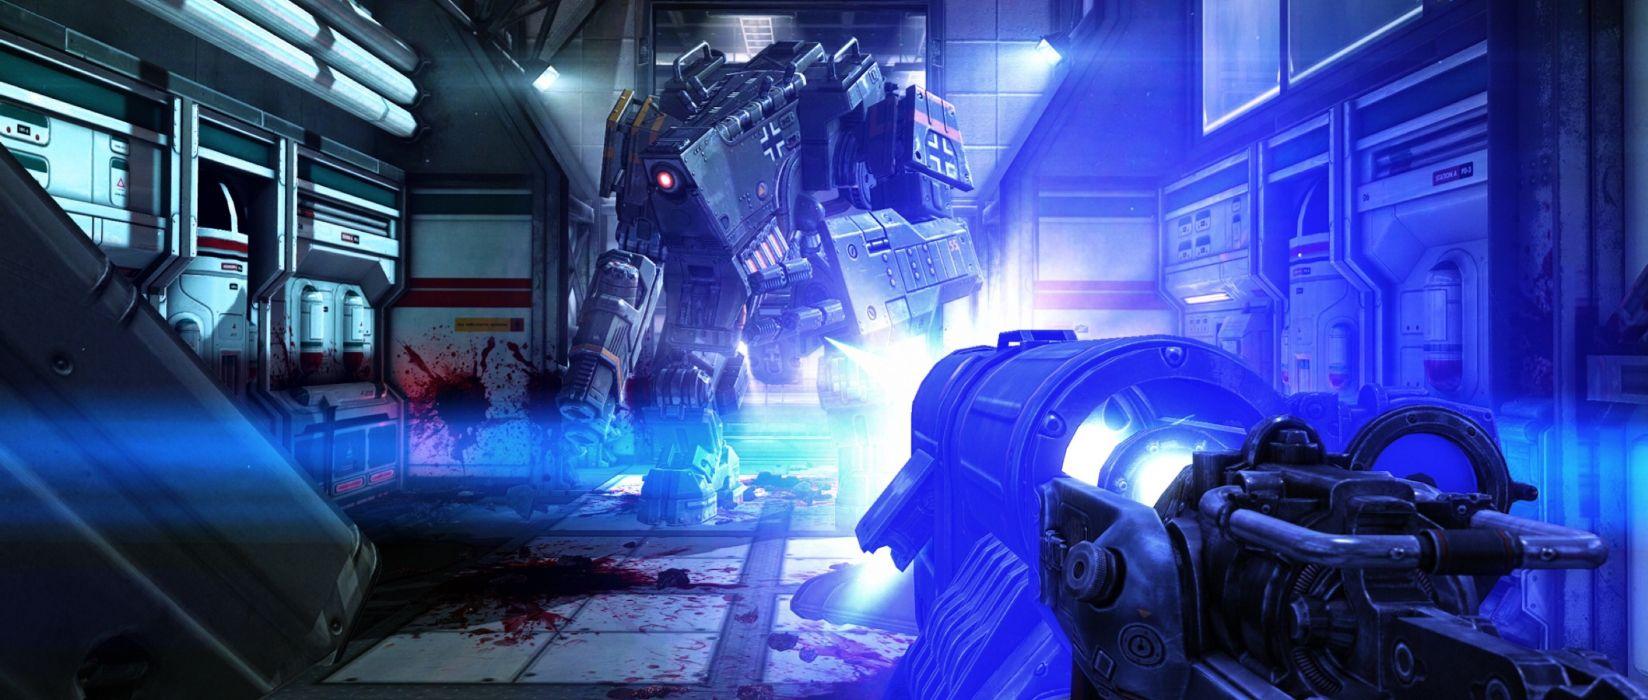 Wolfenstein warrior sci-fi armor robot mecha battle blood       f wallpaper